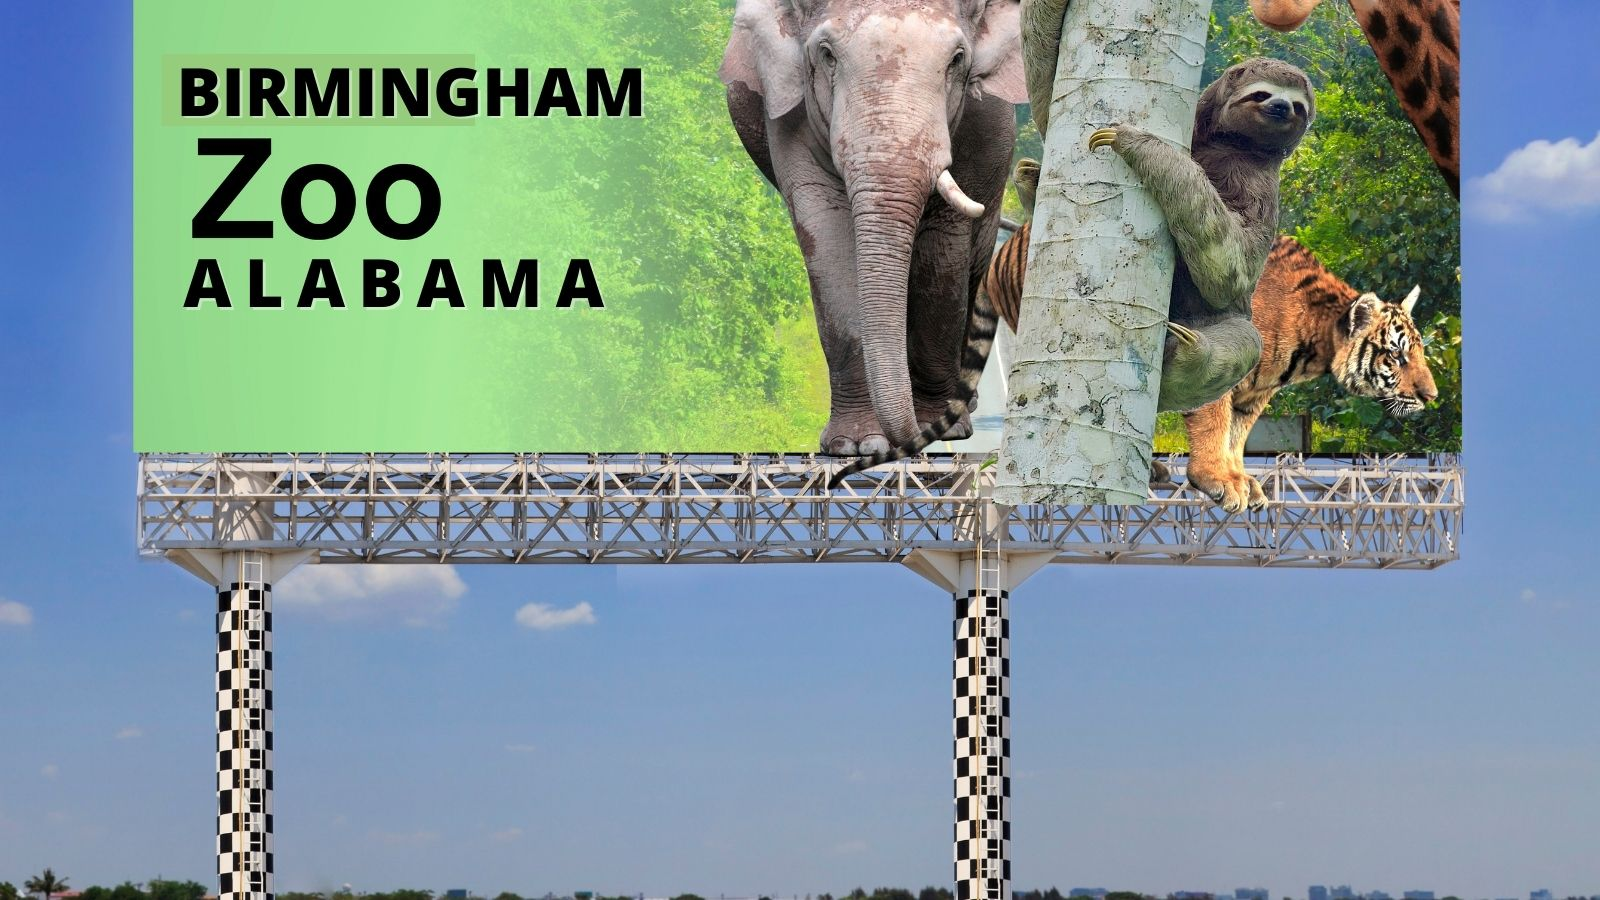 How Did the Birmingham Alabama Zoo Begin